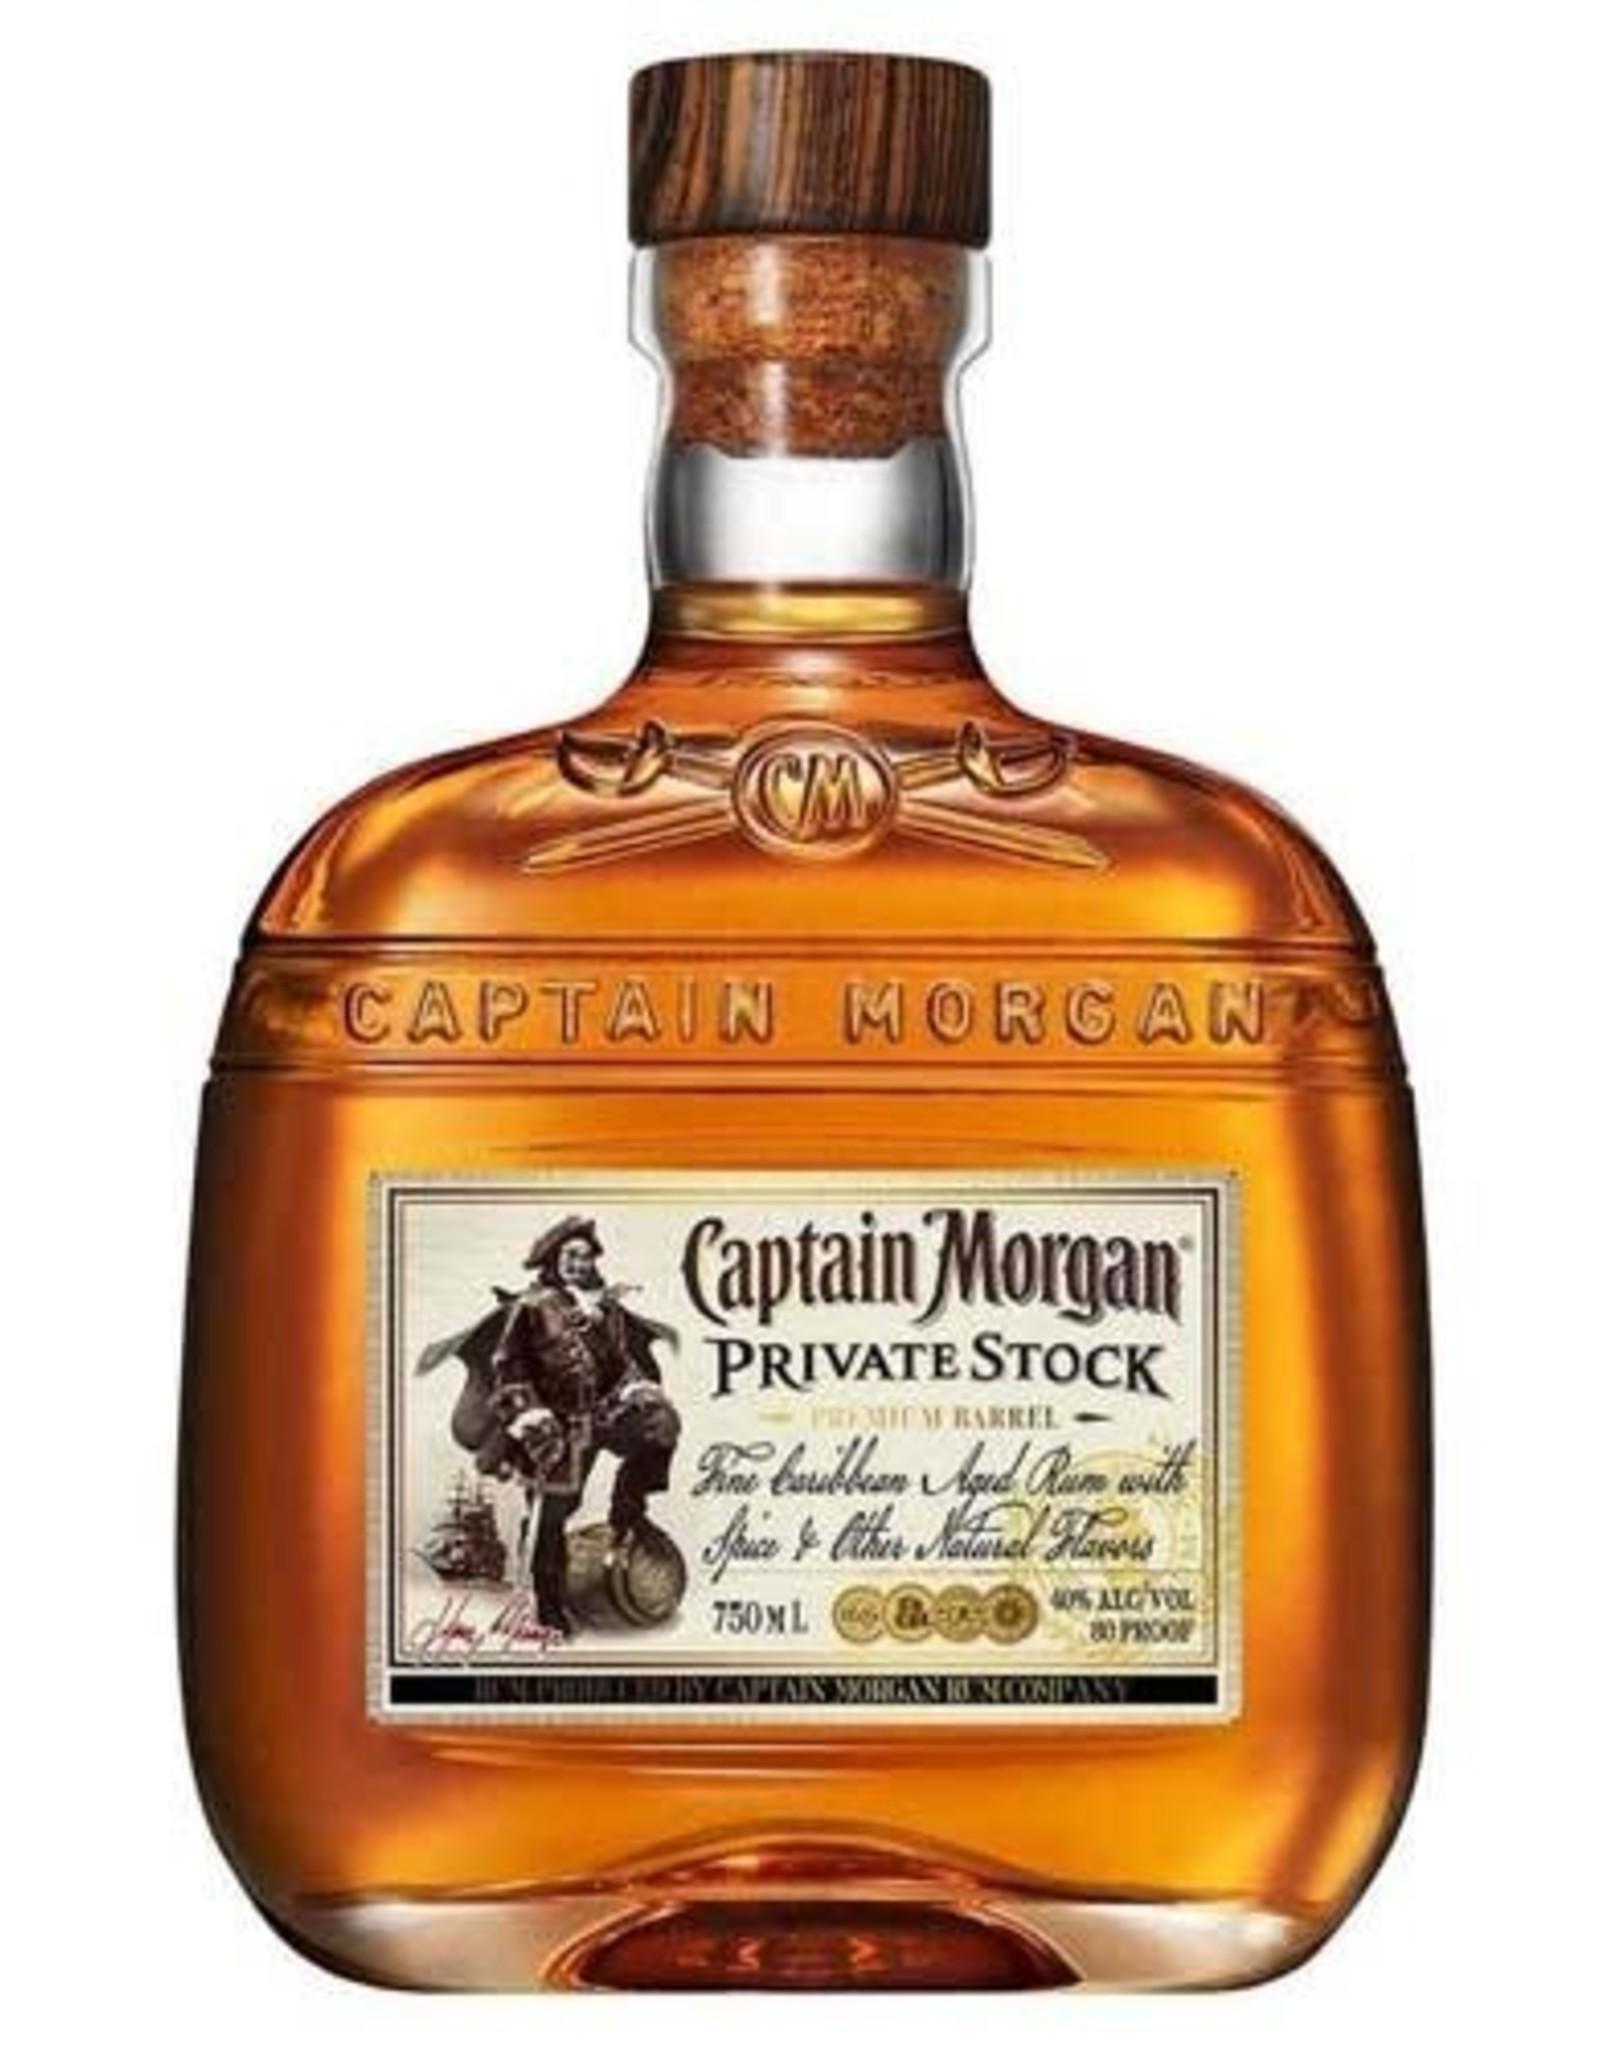 Captain Morgan Captain Morgan Private Stock 750ML